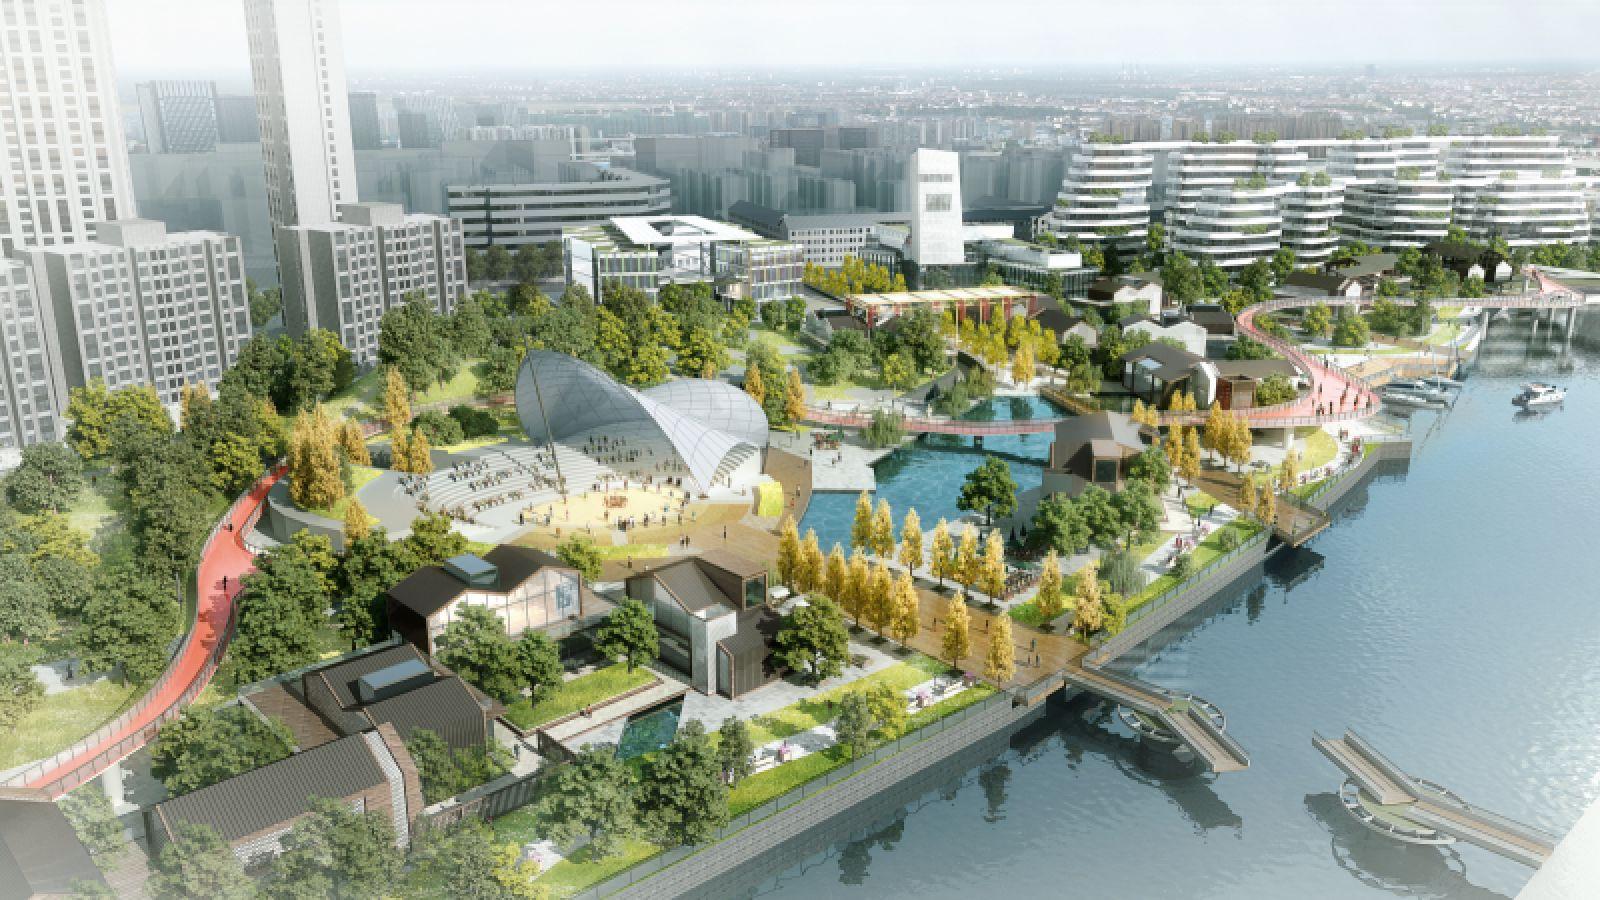 Mengzhuiwan Urban Regeneration